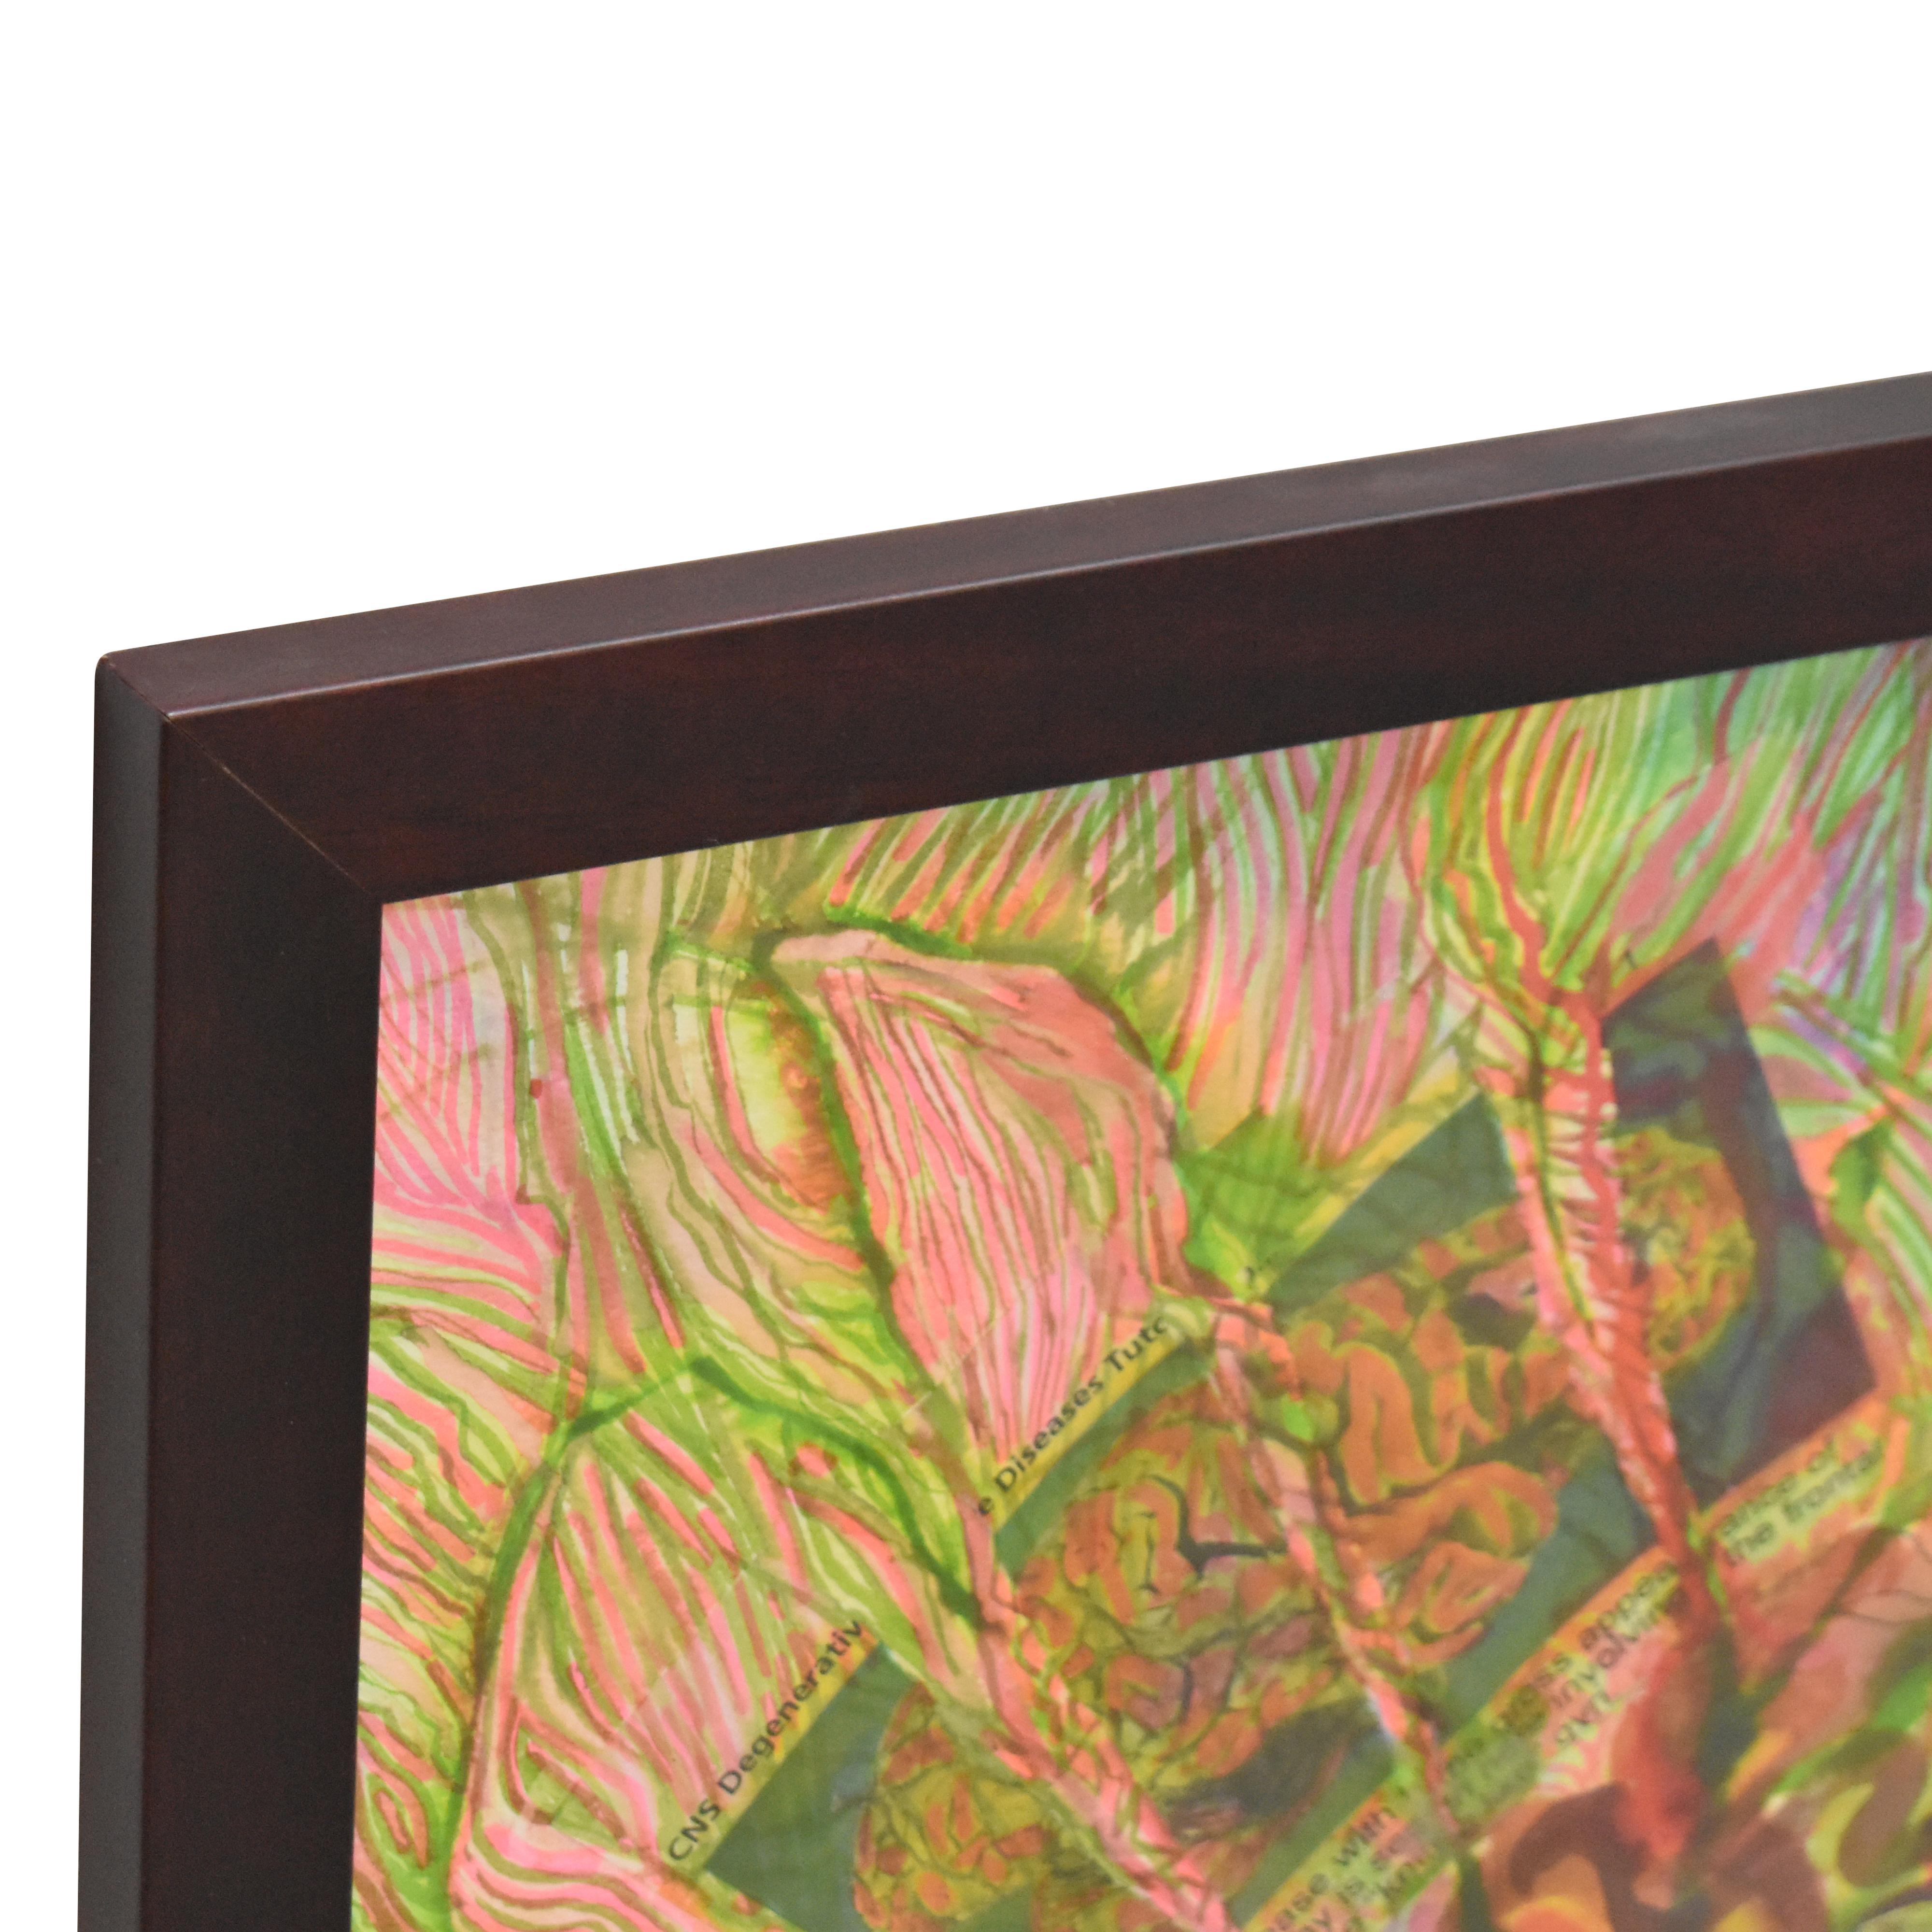 Sybil Falk Sermos Framed Wall Art on sale